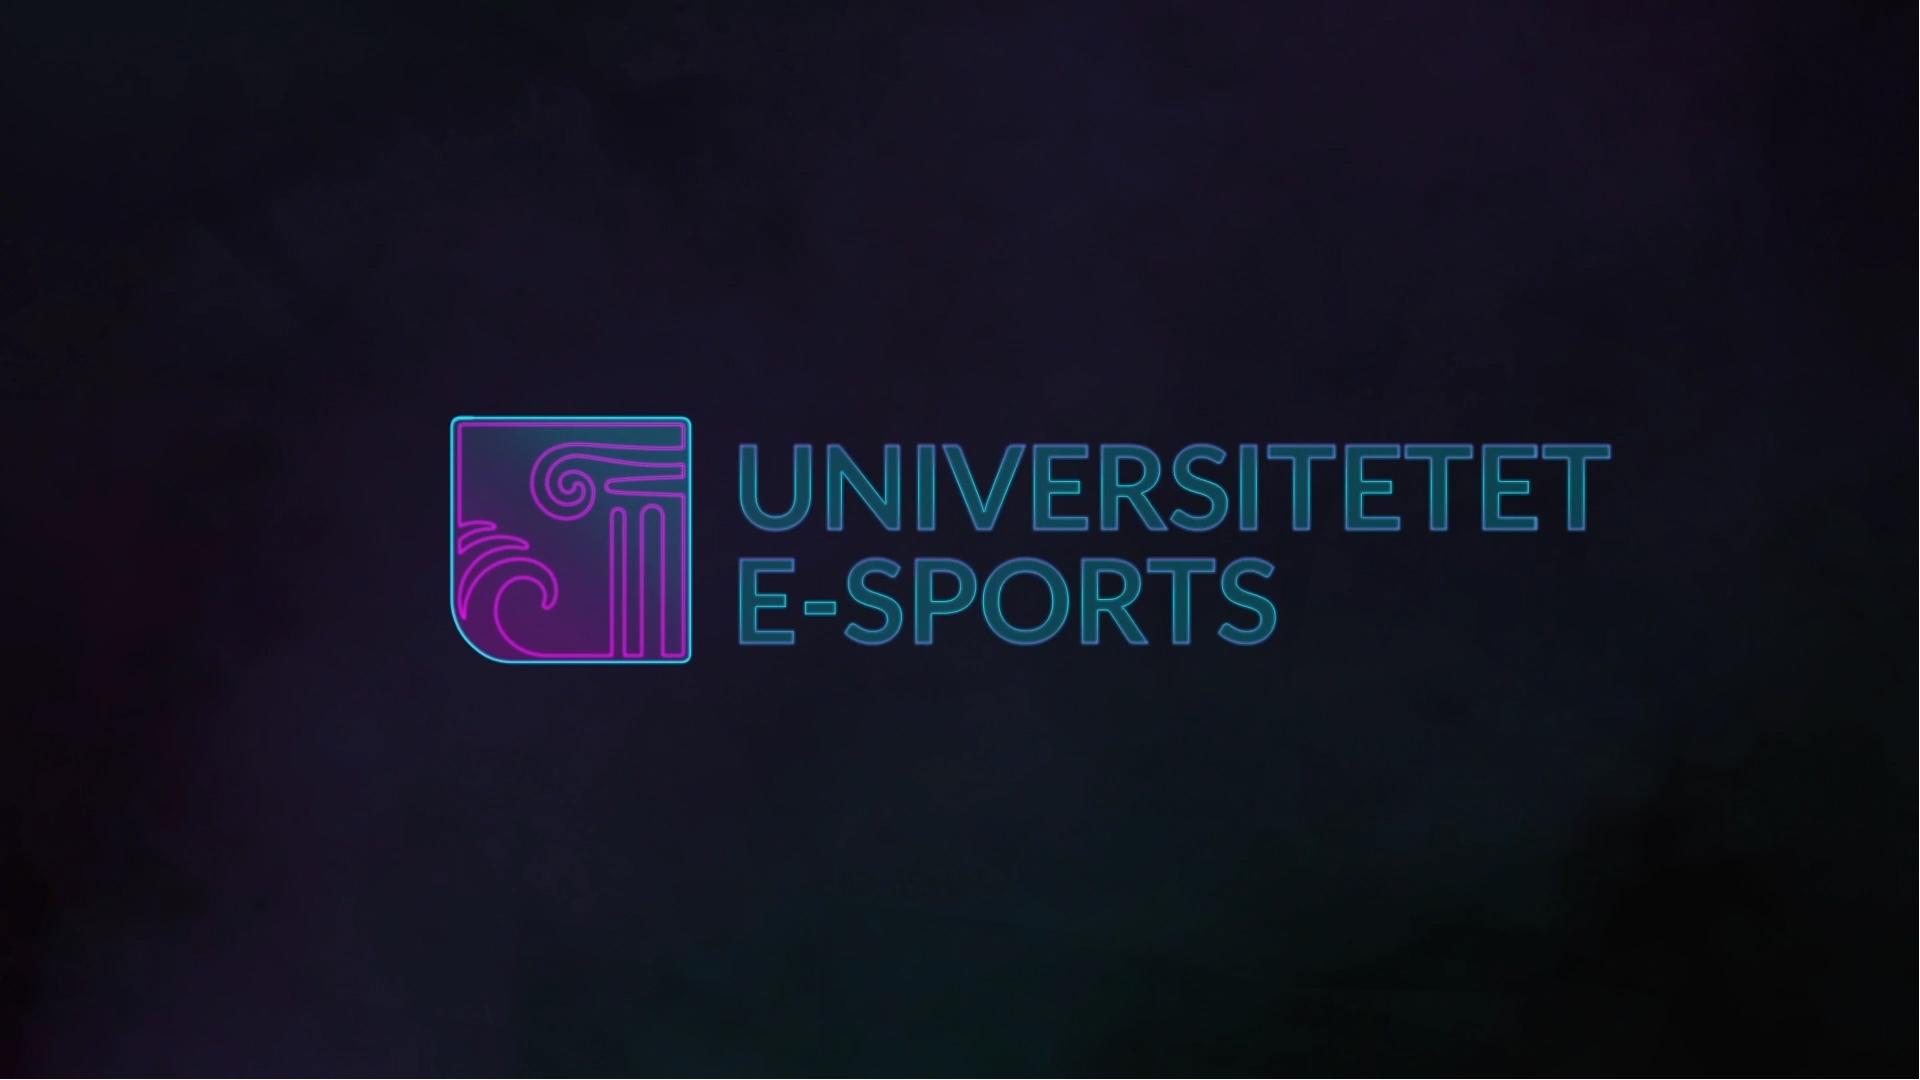 Universitetet E-sport